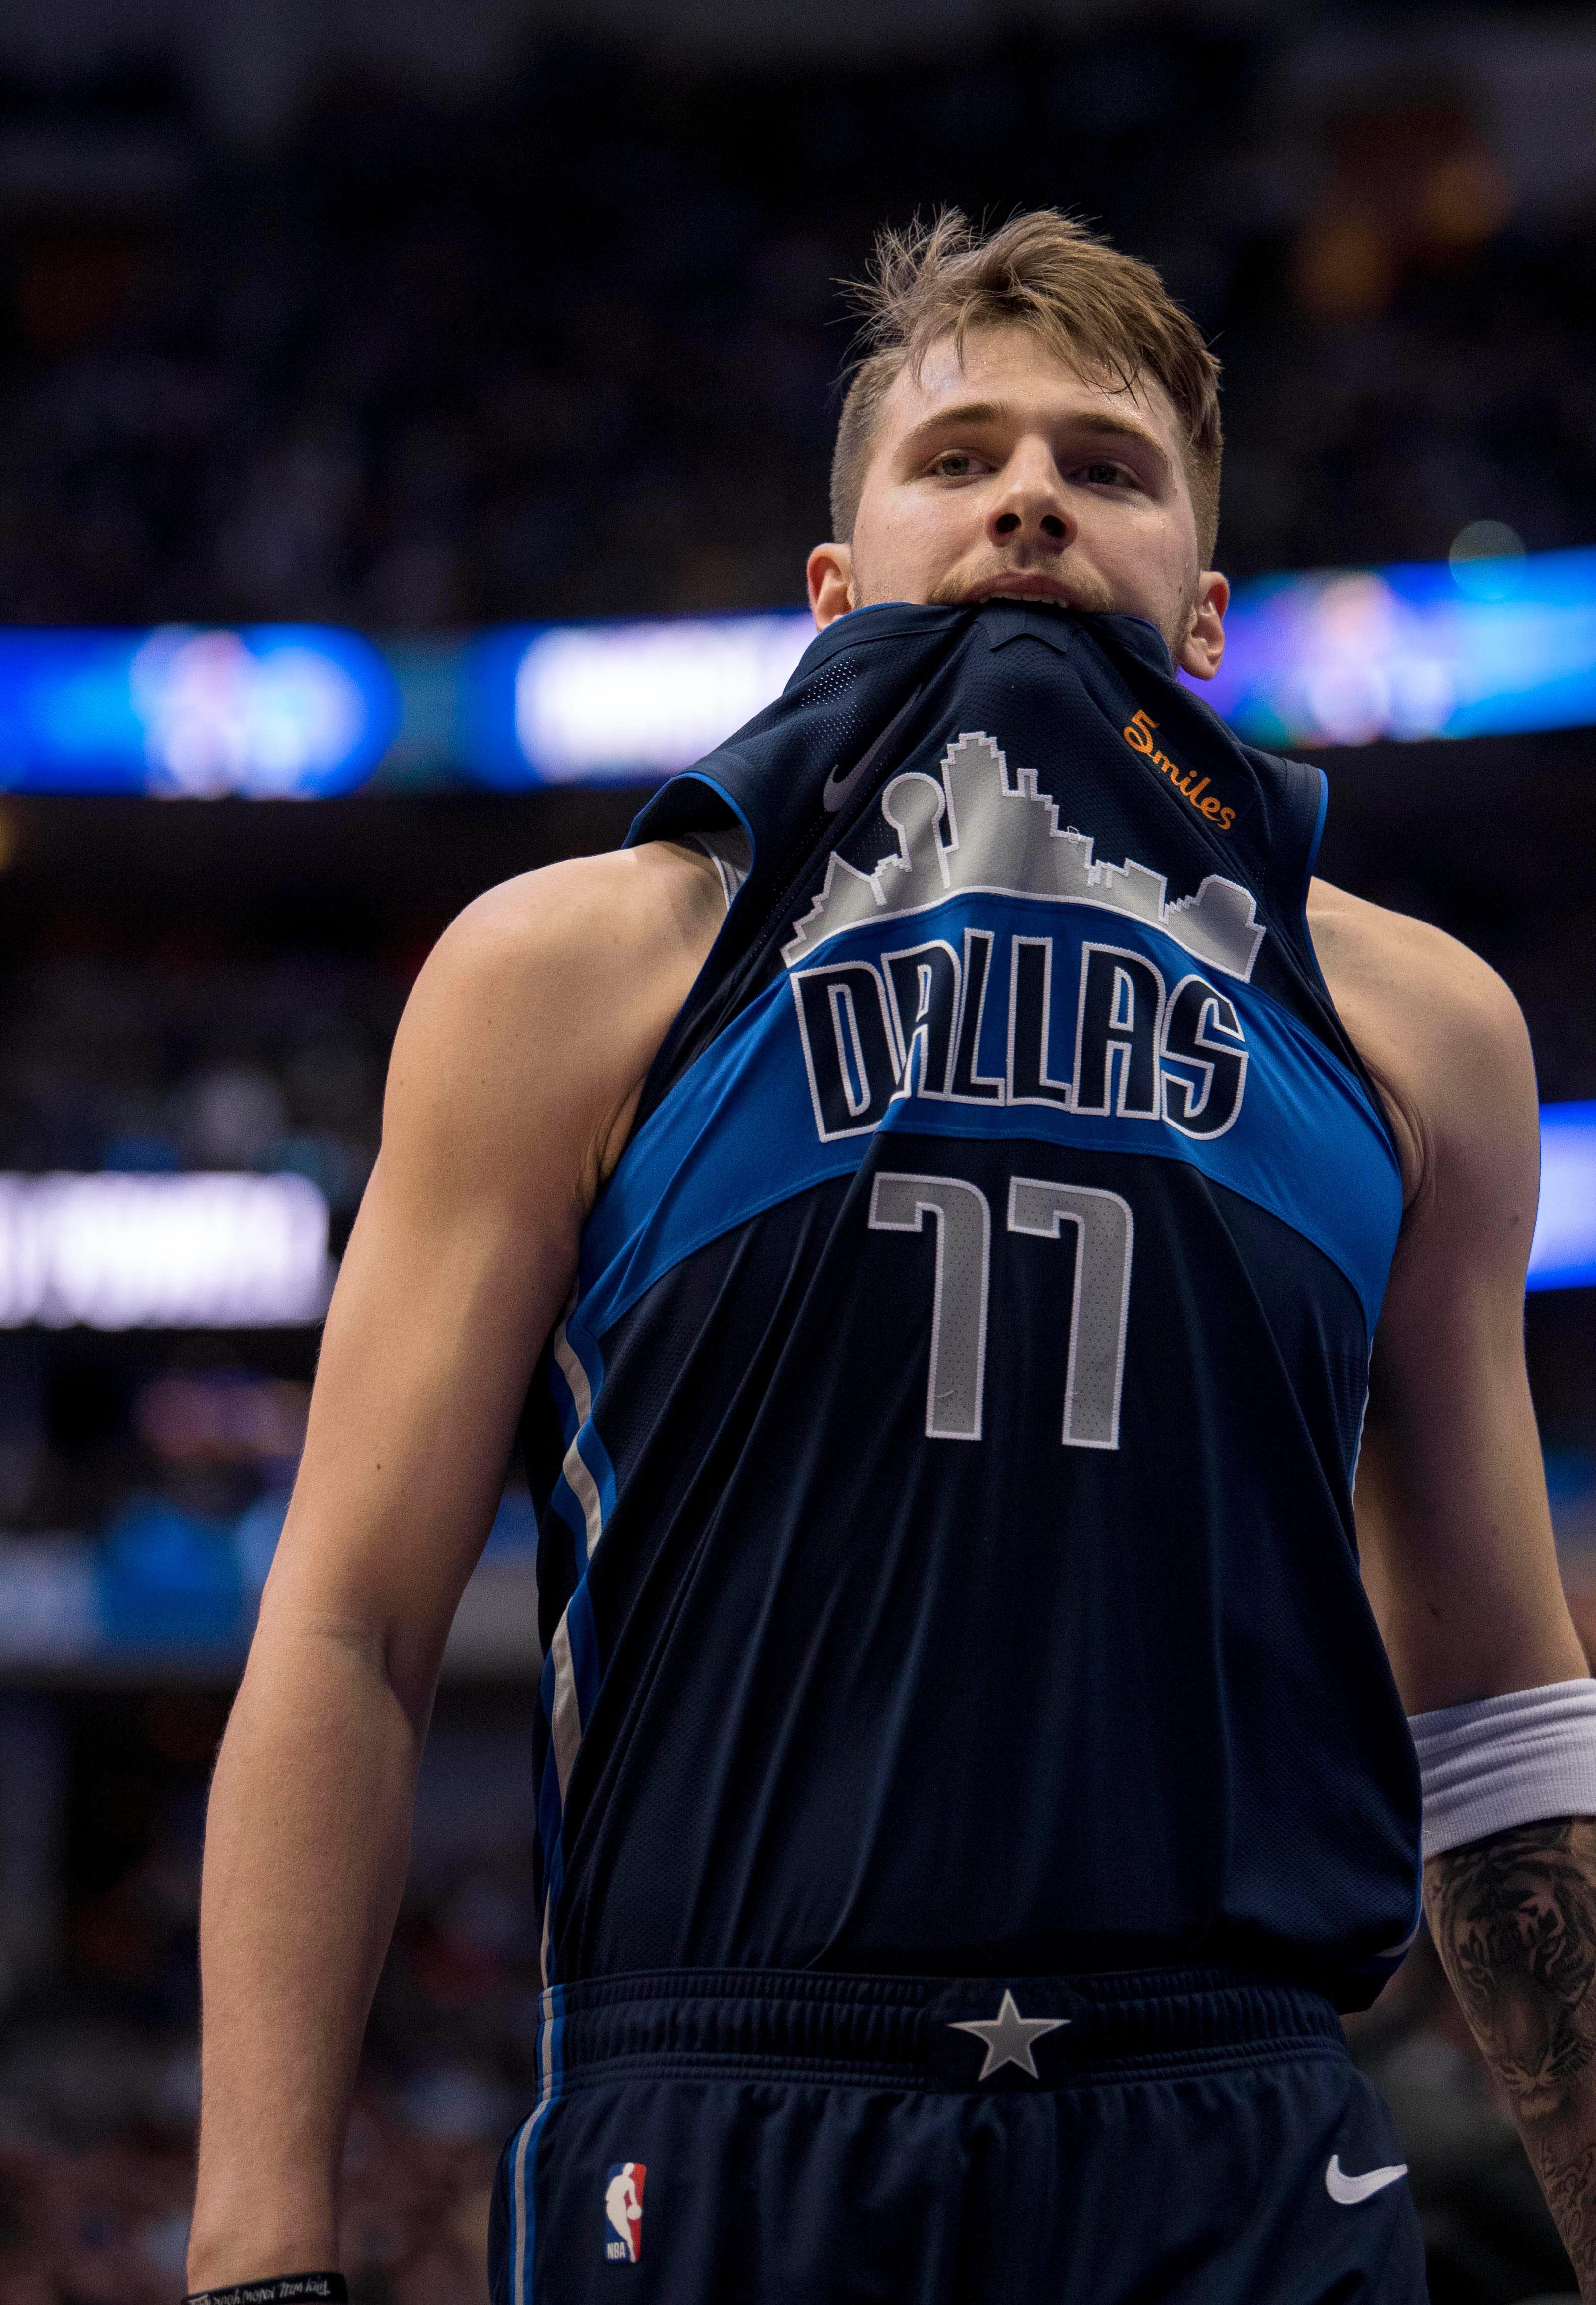 Mavericks' Luka Doncic, the NBA's brightest new star, is most glaring All-Star snub